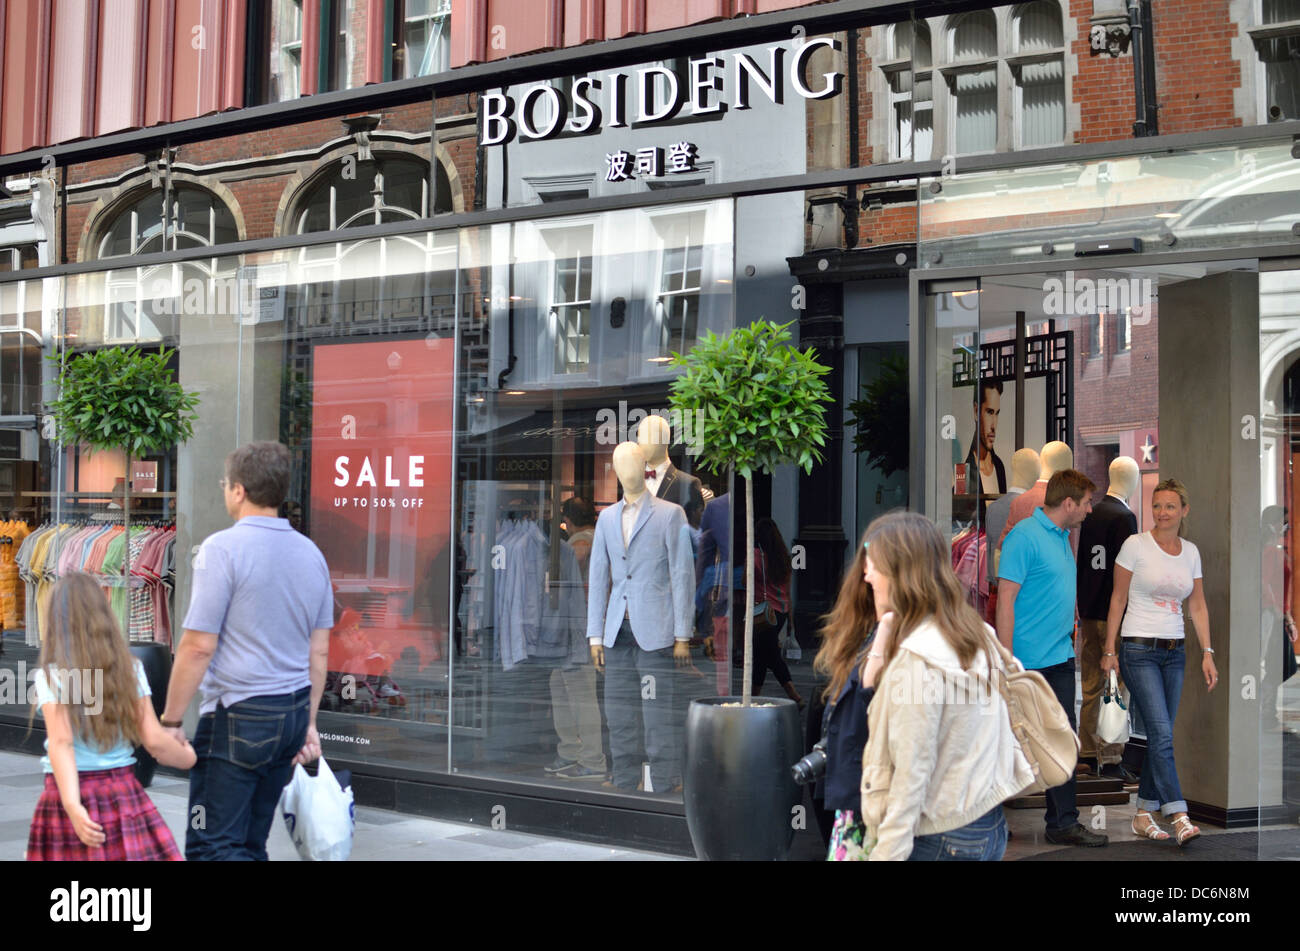 Bosideng men's fashion store in South Molton Street, Mayfair, London, UK. - Stock Image